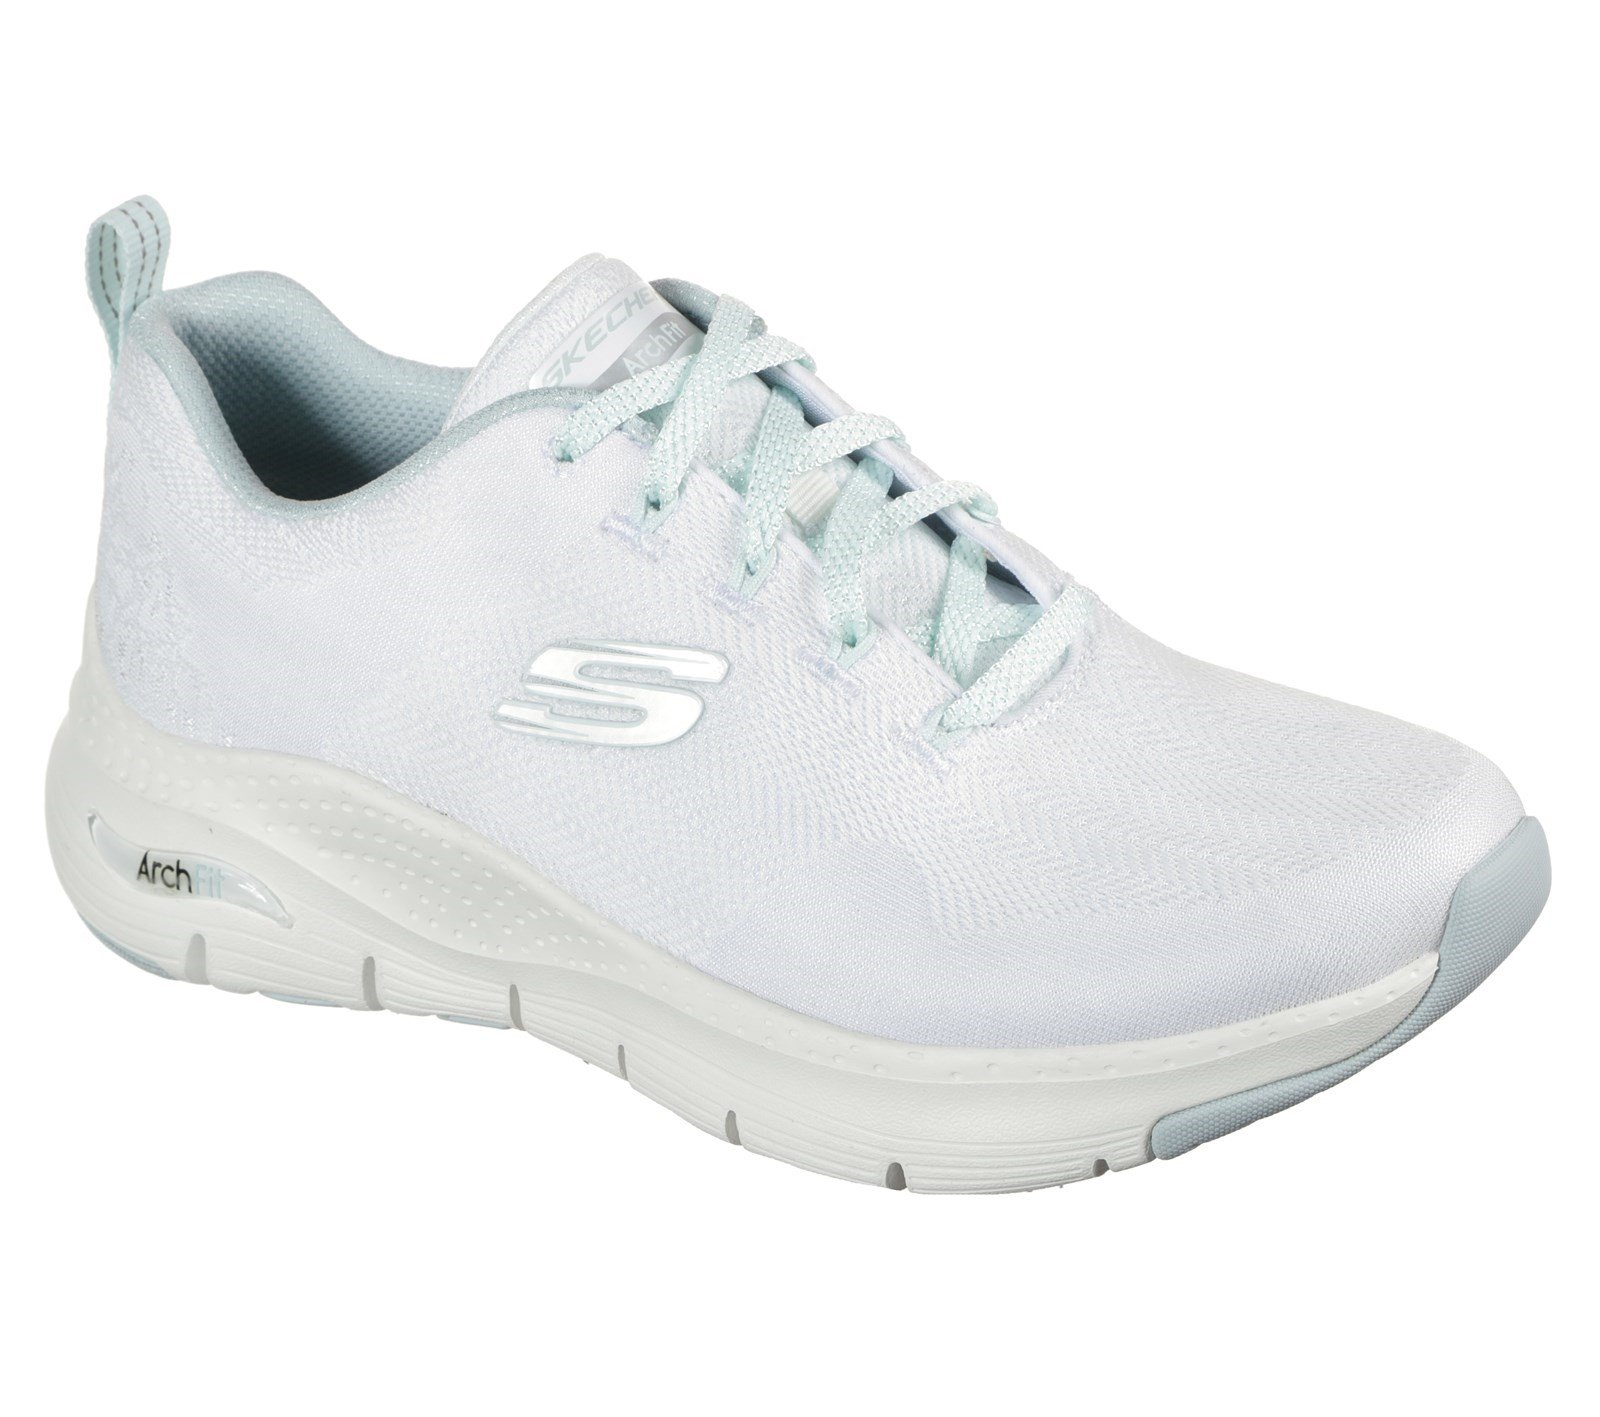 Skechers Women's Arch Fit Comfy Wave Trainer Various Colours 31042 - White/Mint 3